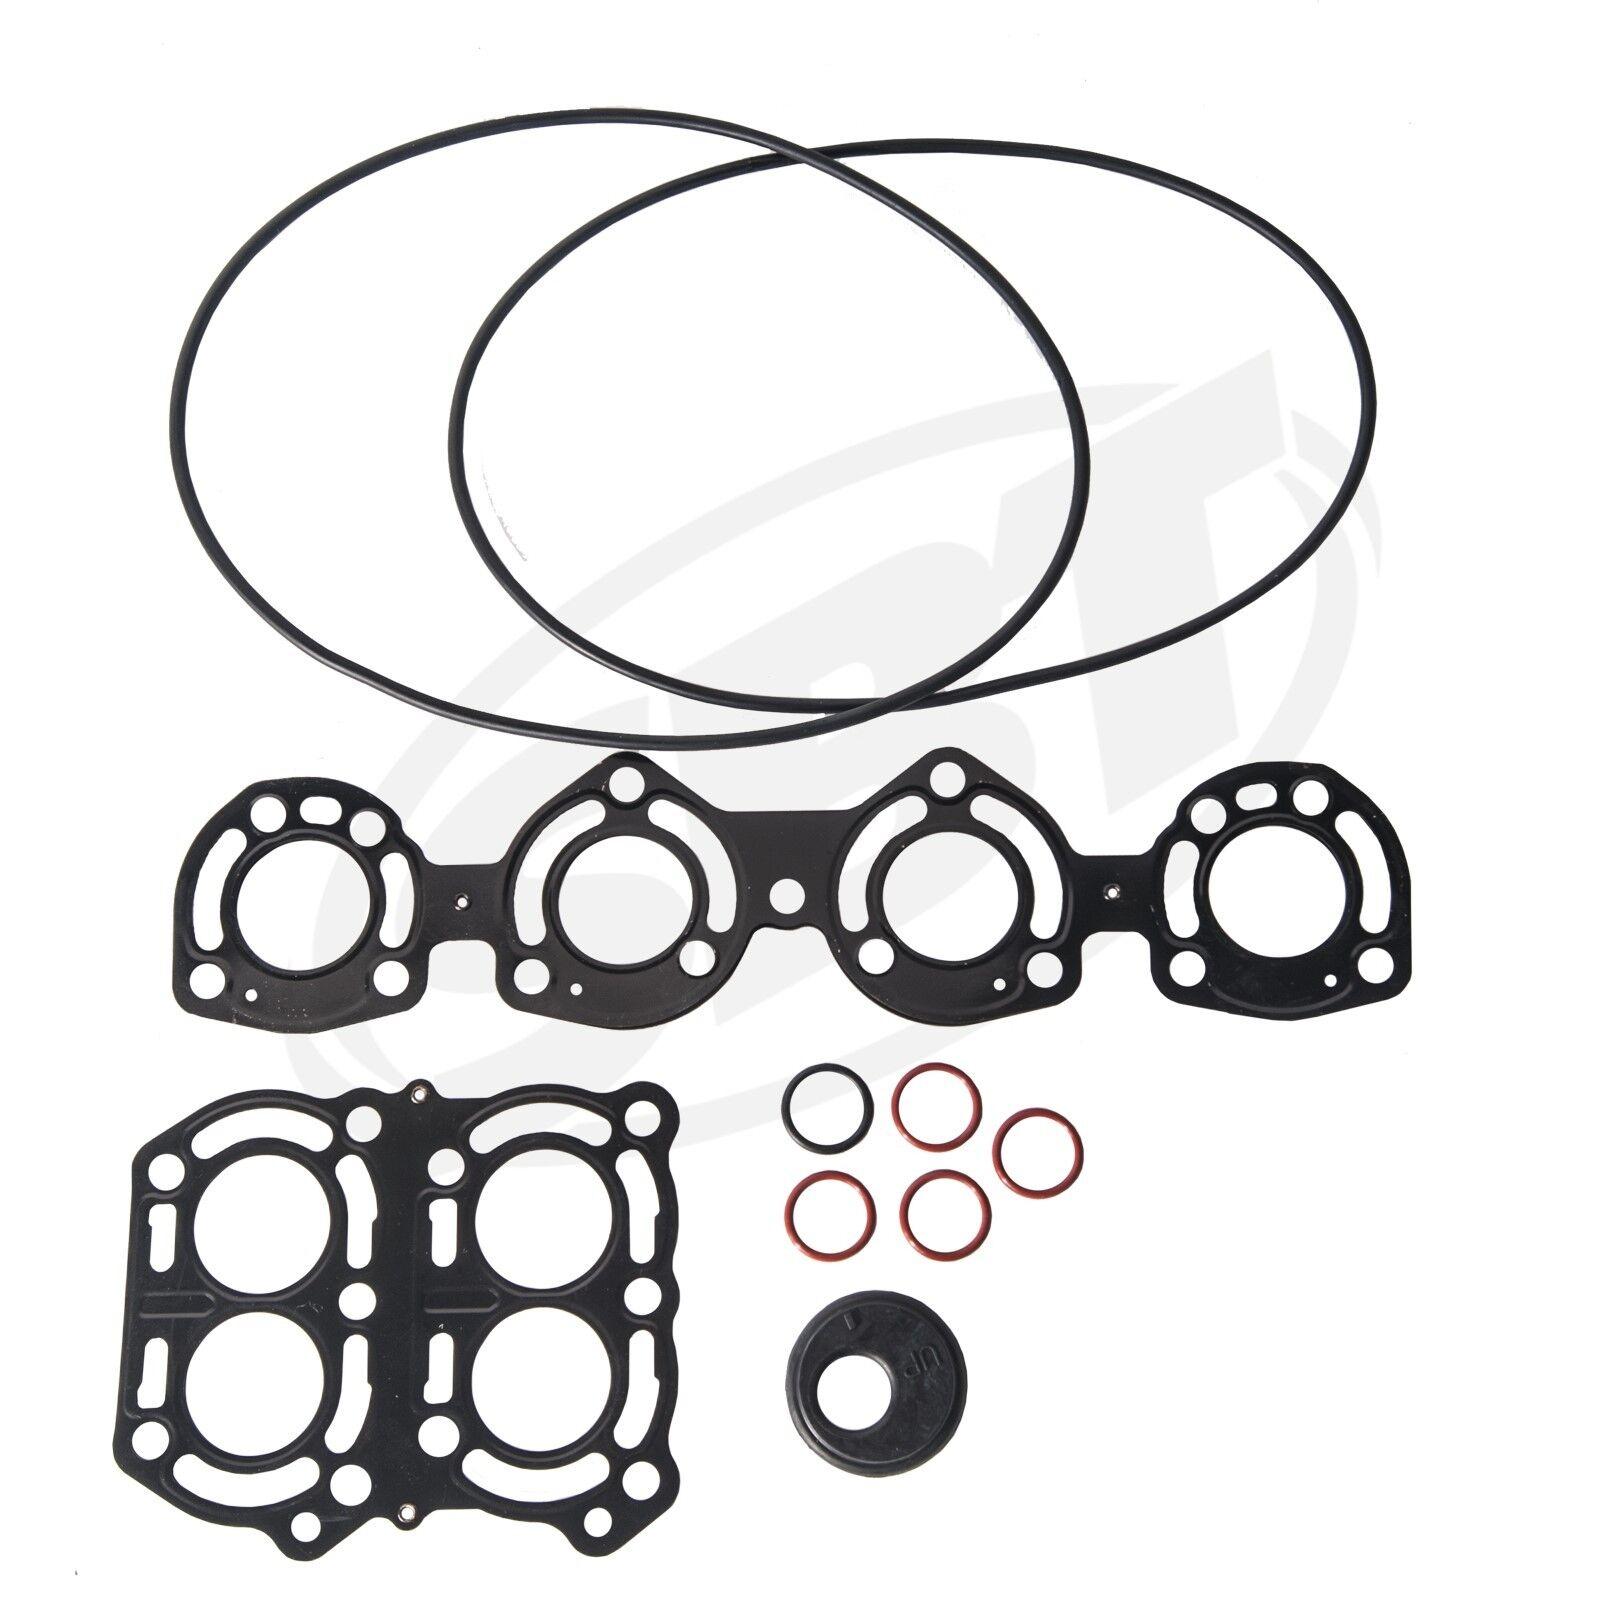 Yamaha FX HO Installation Gasket Kit /FX 140 HO/SX 230/FX